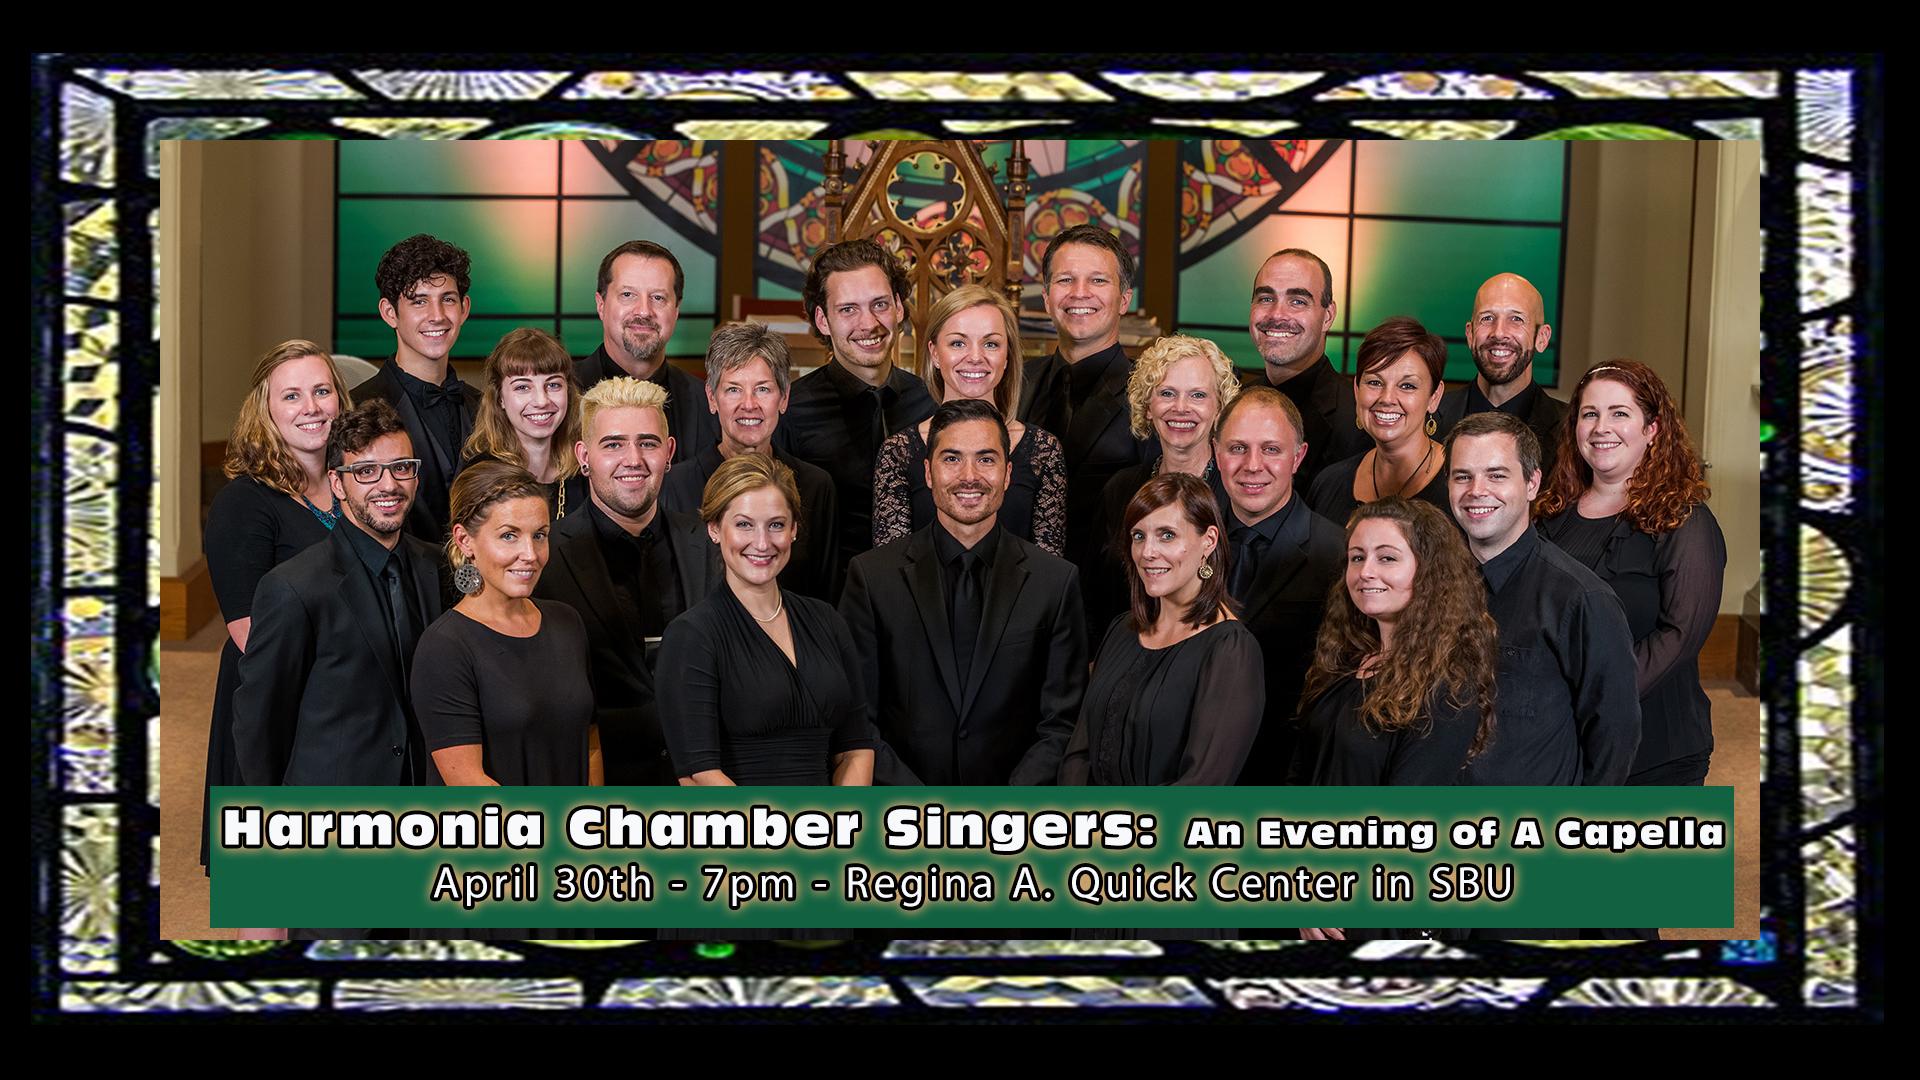 Harmonia Chamber Singer perform at St. Bonaventure